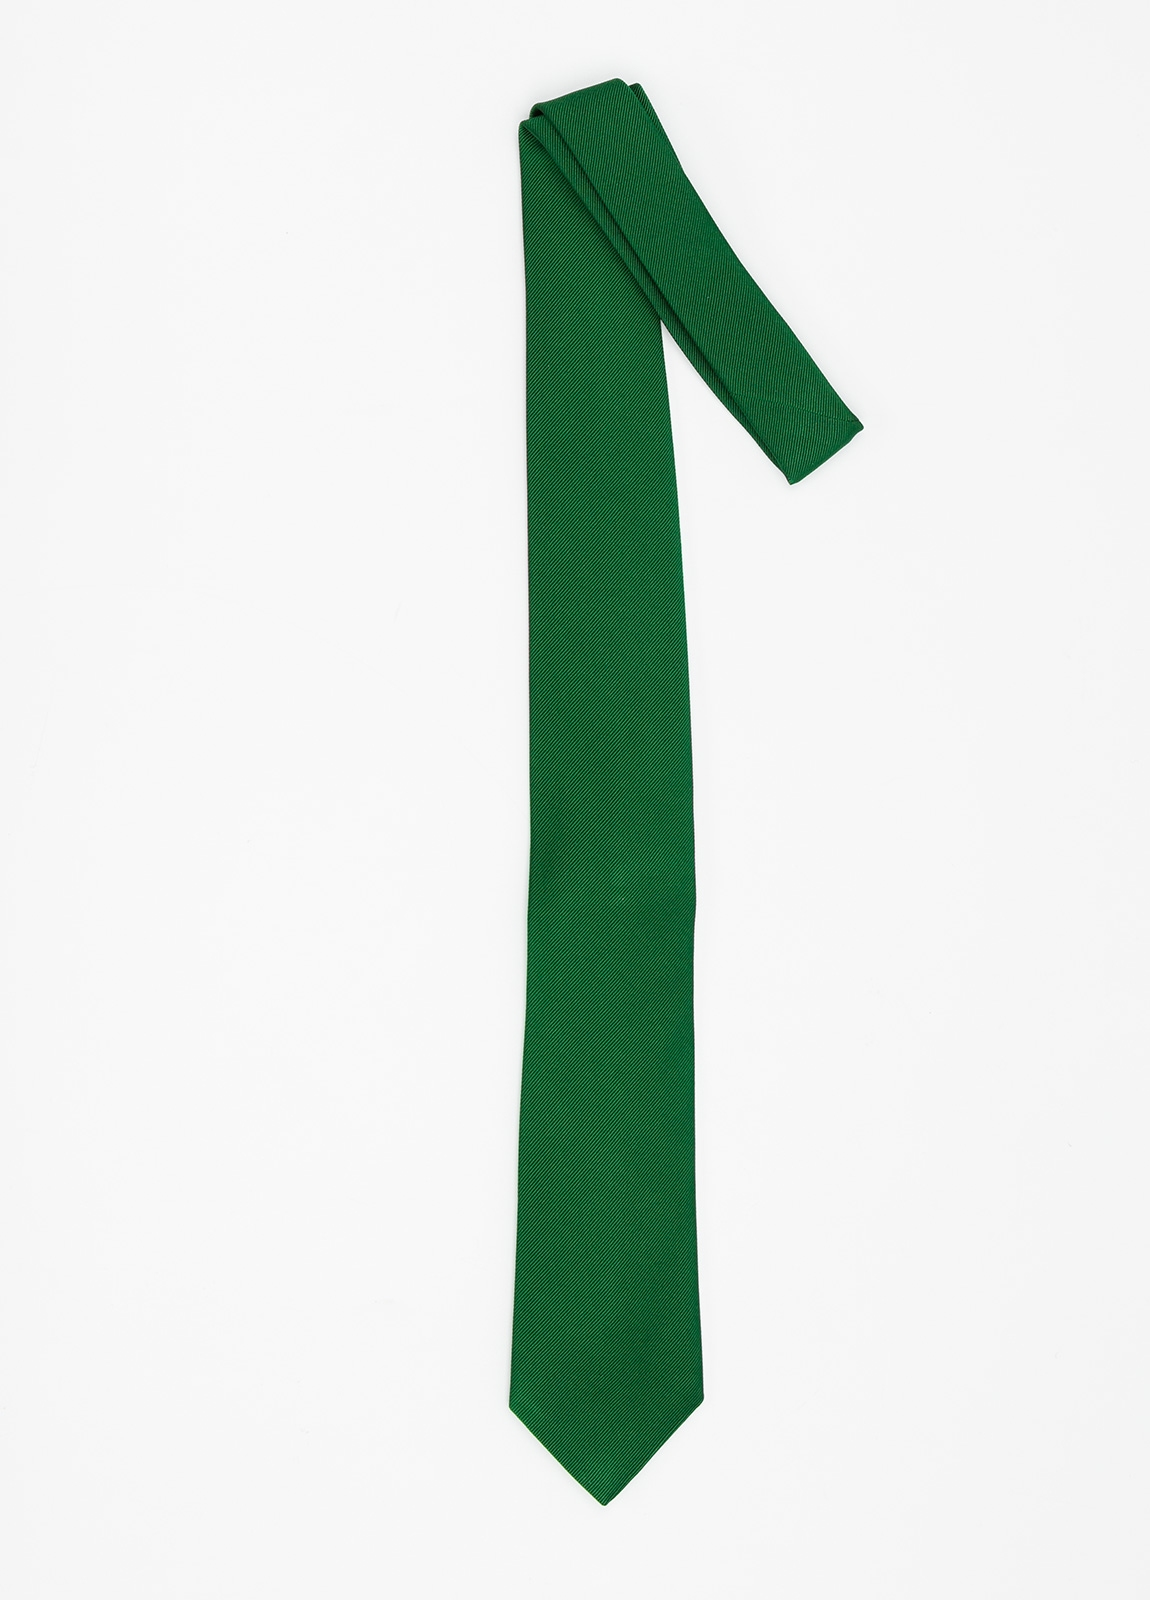 Corbata Formal Wear microtextura color verde. Pala 7,5 cm. 70% Seda 30% Algodón. - Ítem1